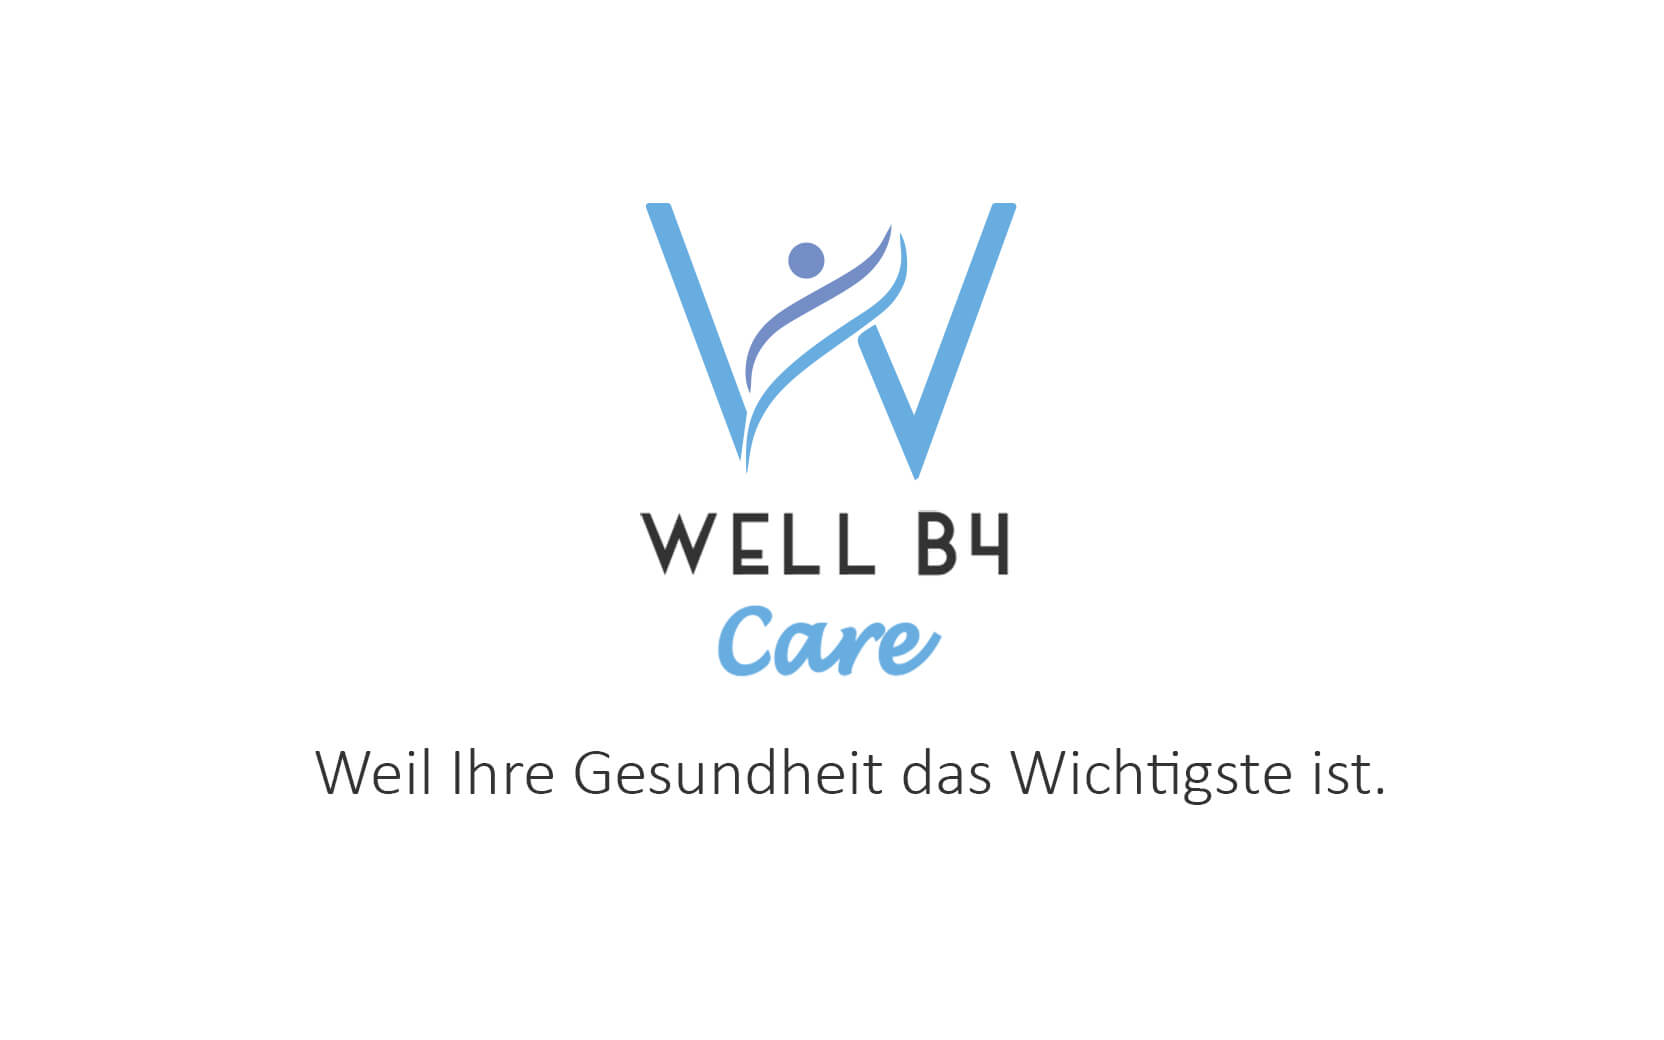 Well B4 Care Gesundheit